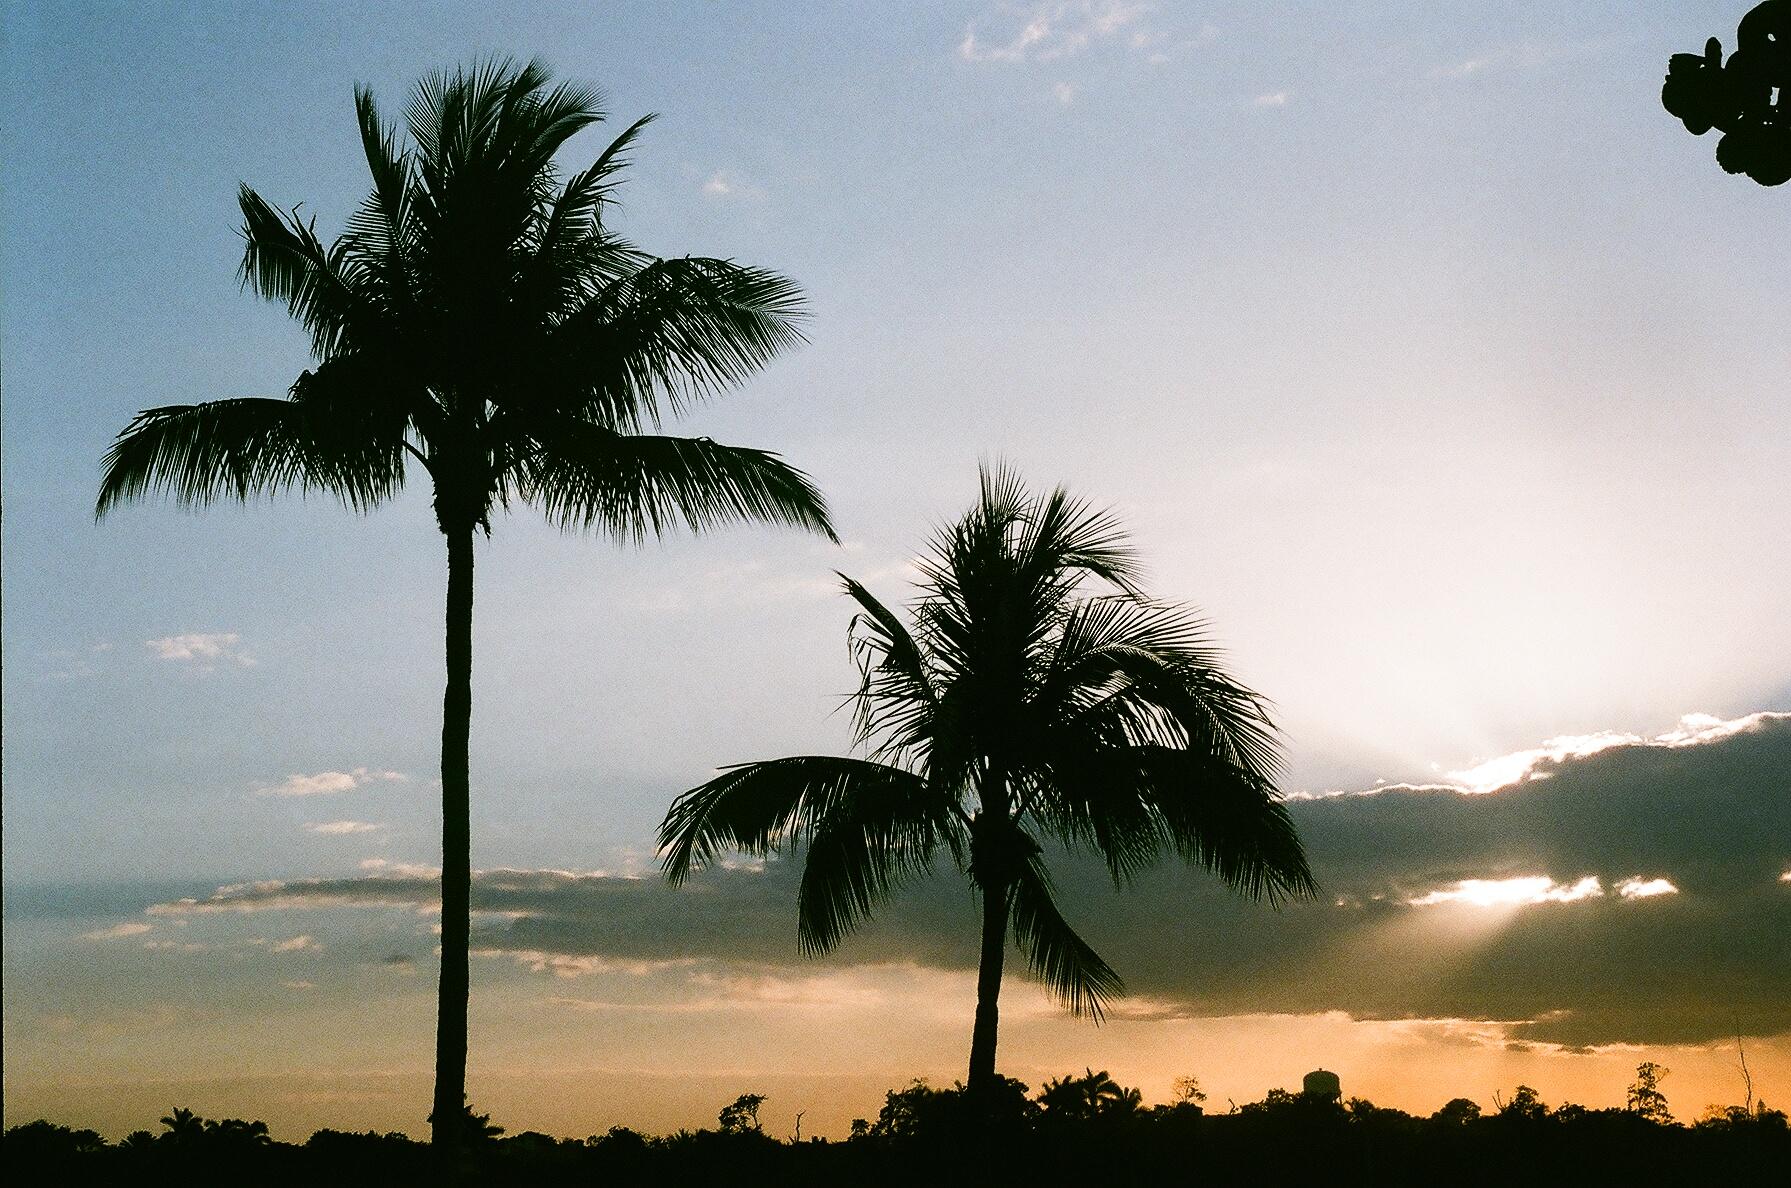 Sunset in Boca Raton, FL. Spring 2016. (Agfa Vista Plus 200)